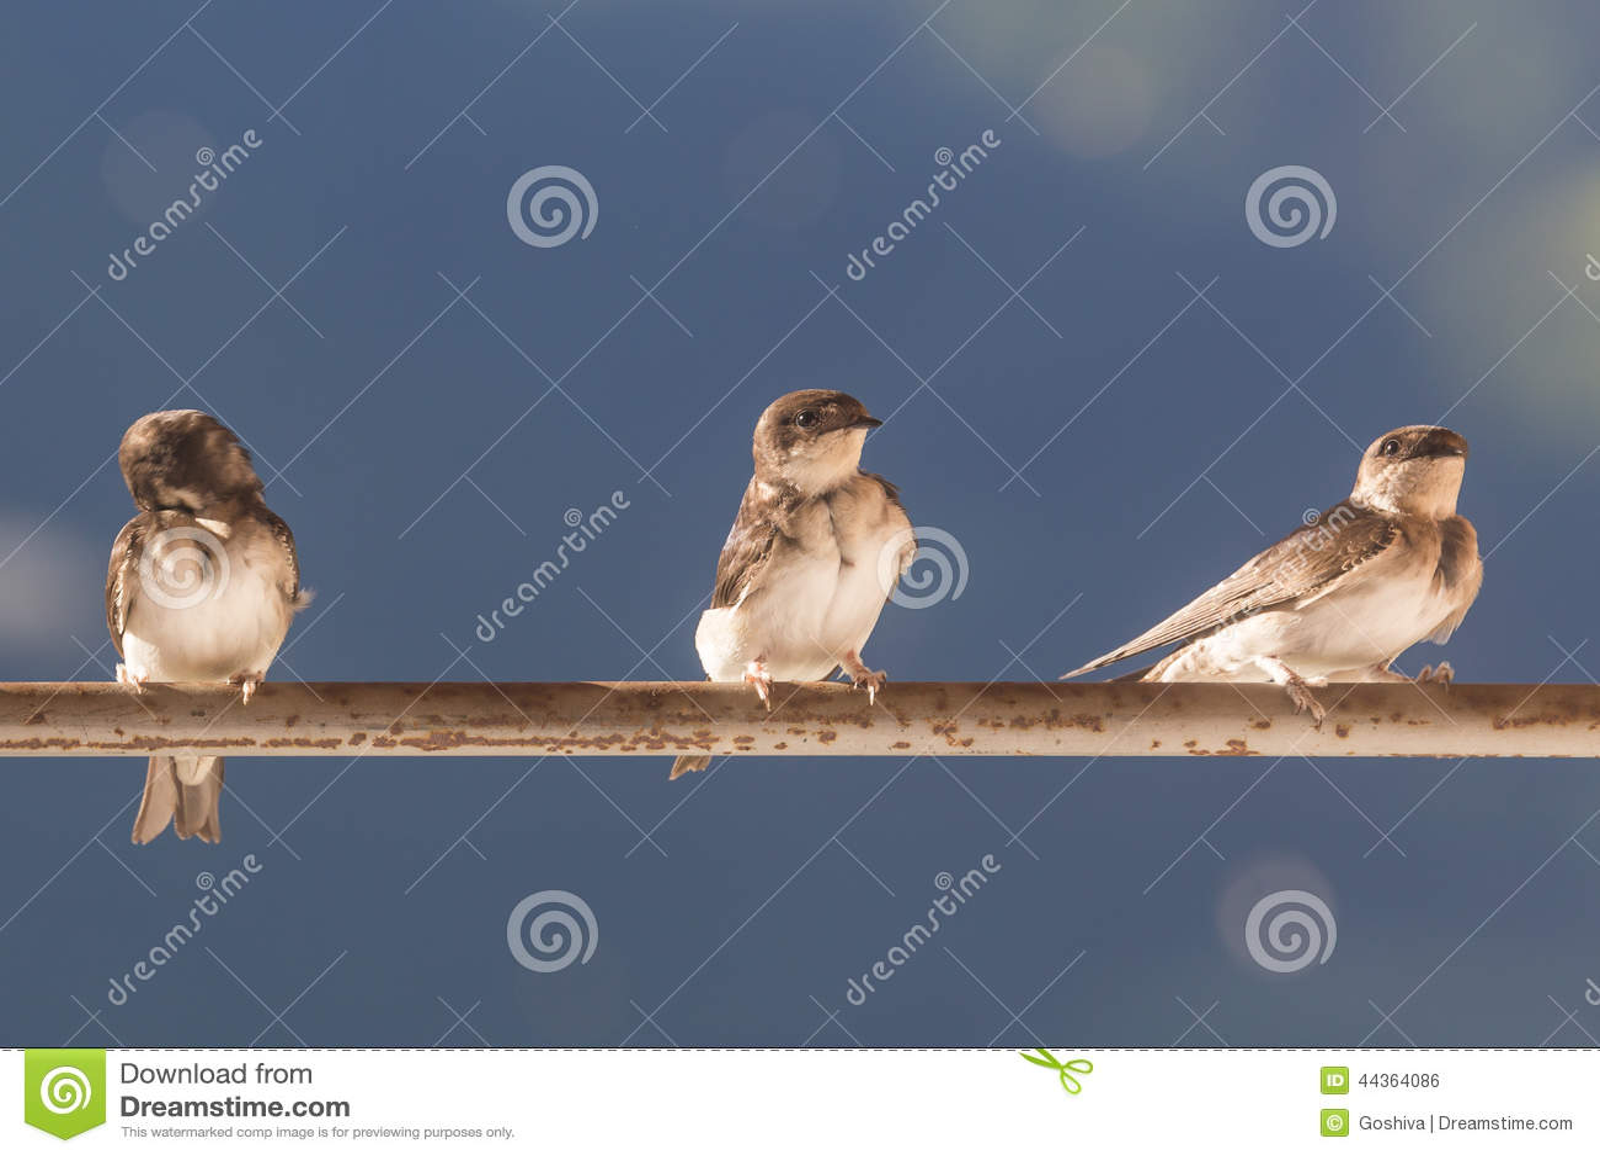 Uccelli (sorsi) su una barra trasversale